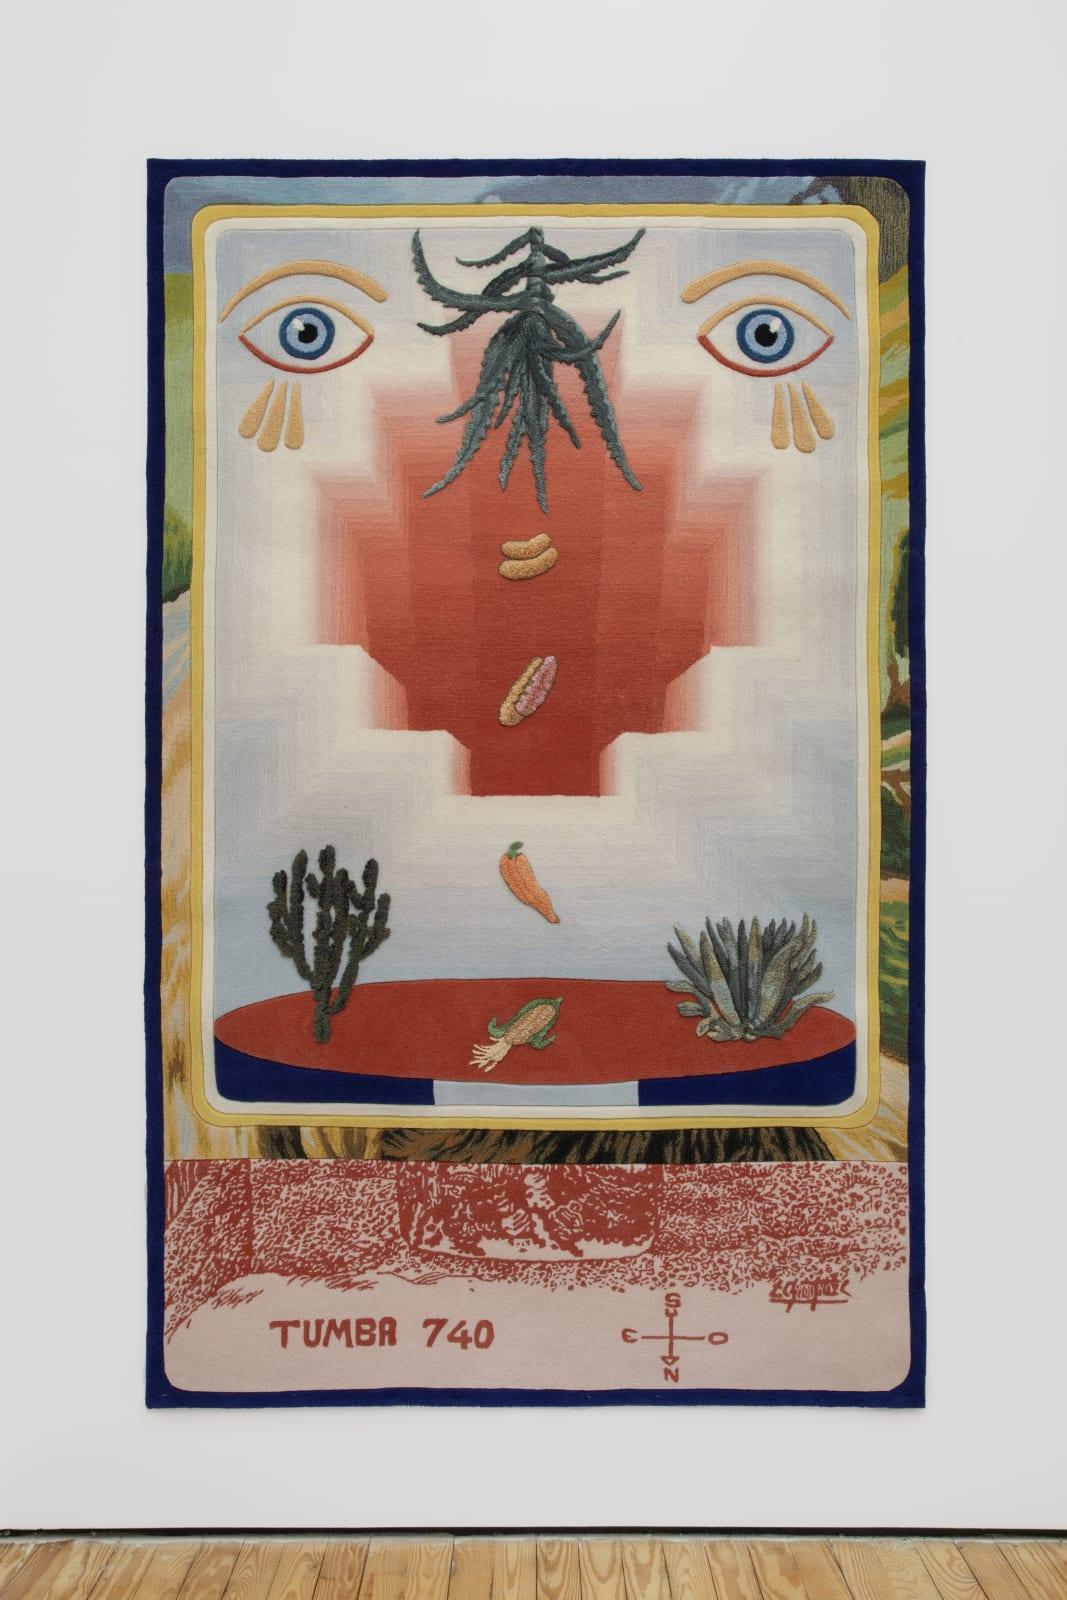 Kimsa Pacha, 2020 Tufting 250 x 156 cm | 98 3/8 x 61 3/8 in Edition 2/3 + 1AP $ 10,000.00